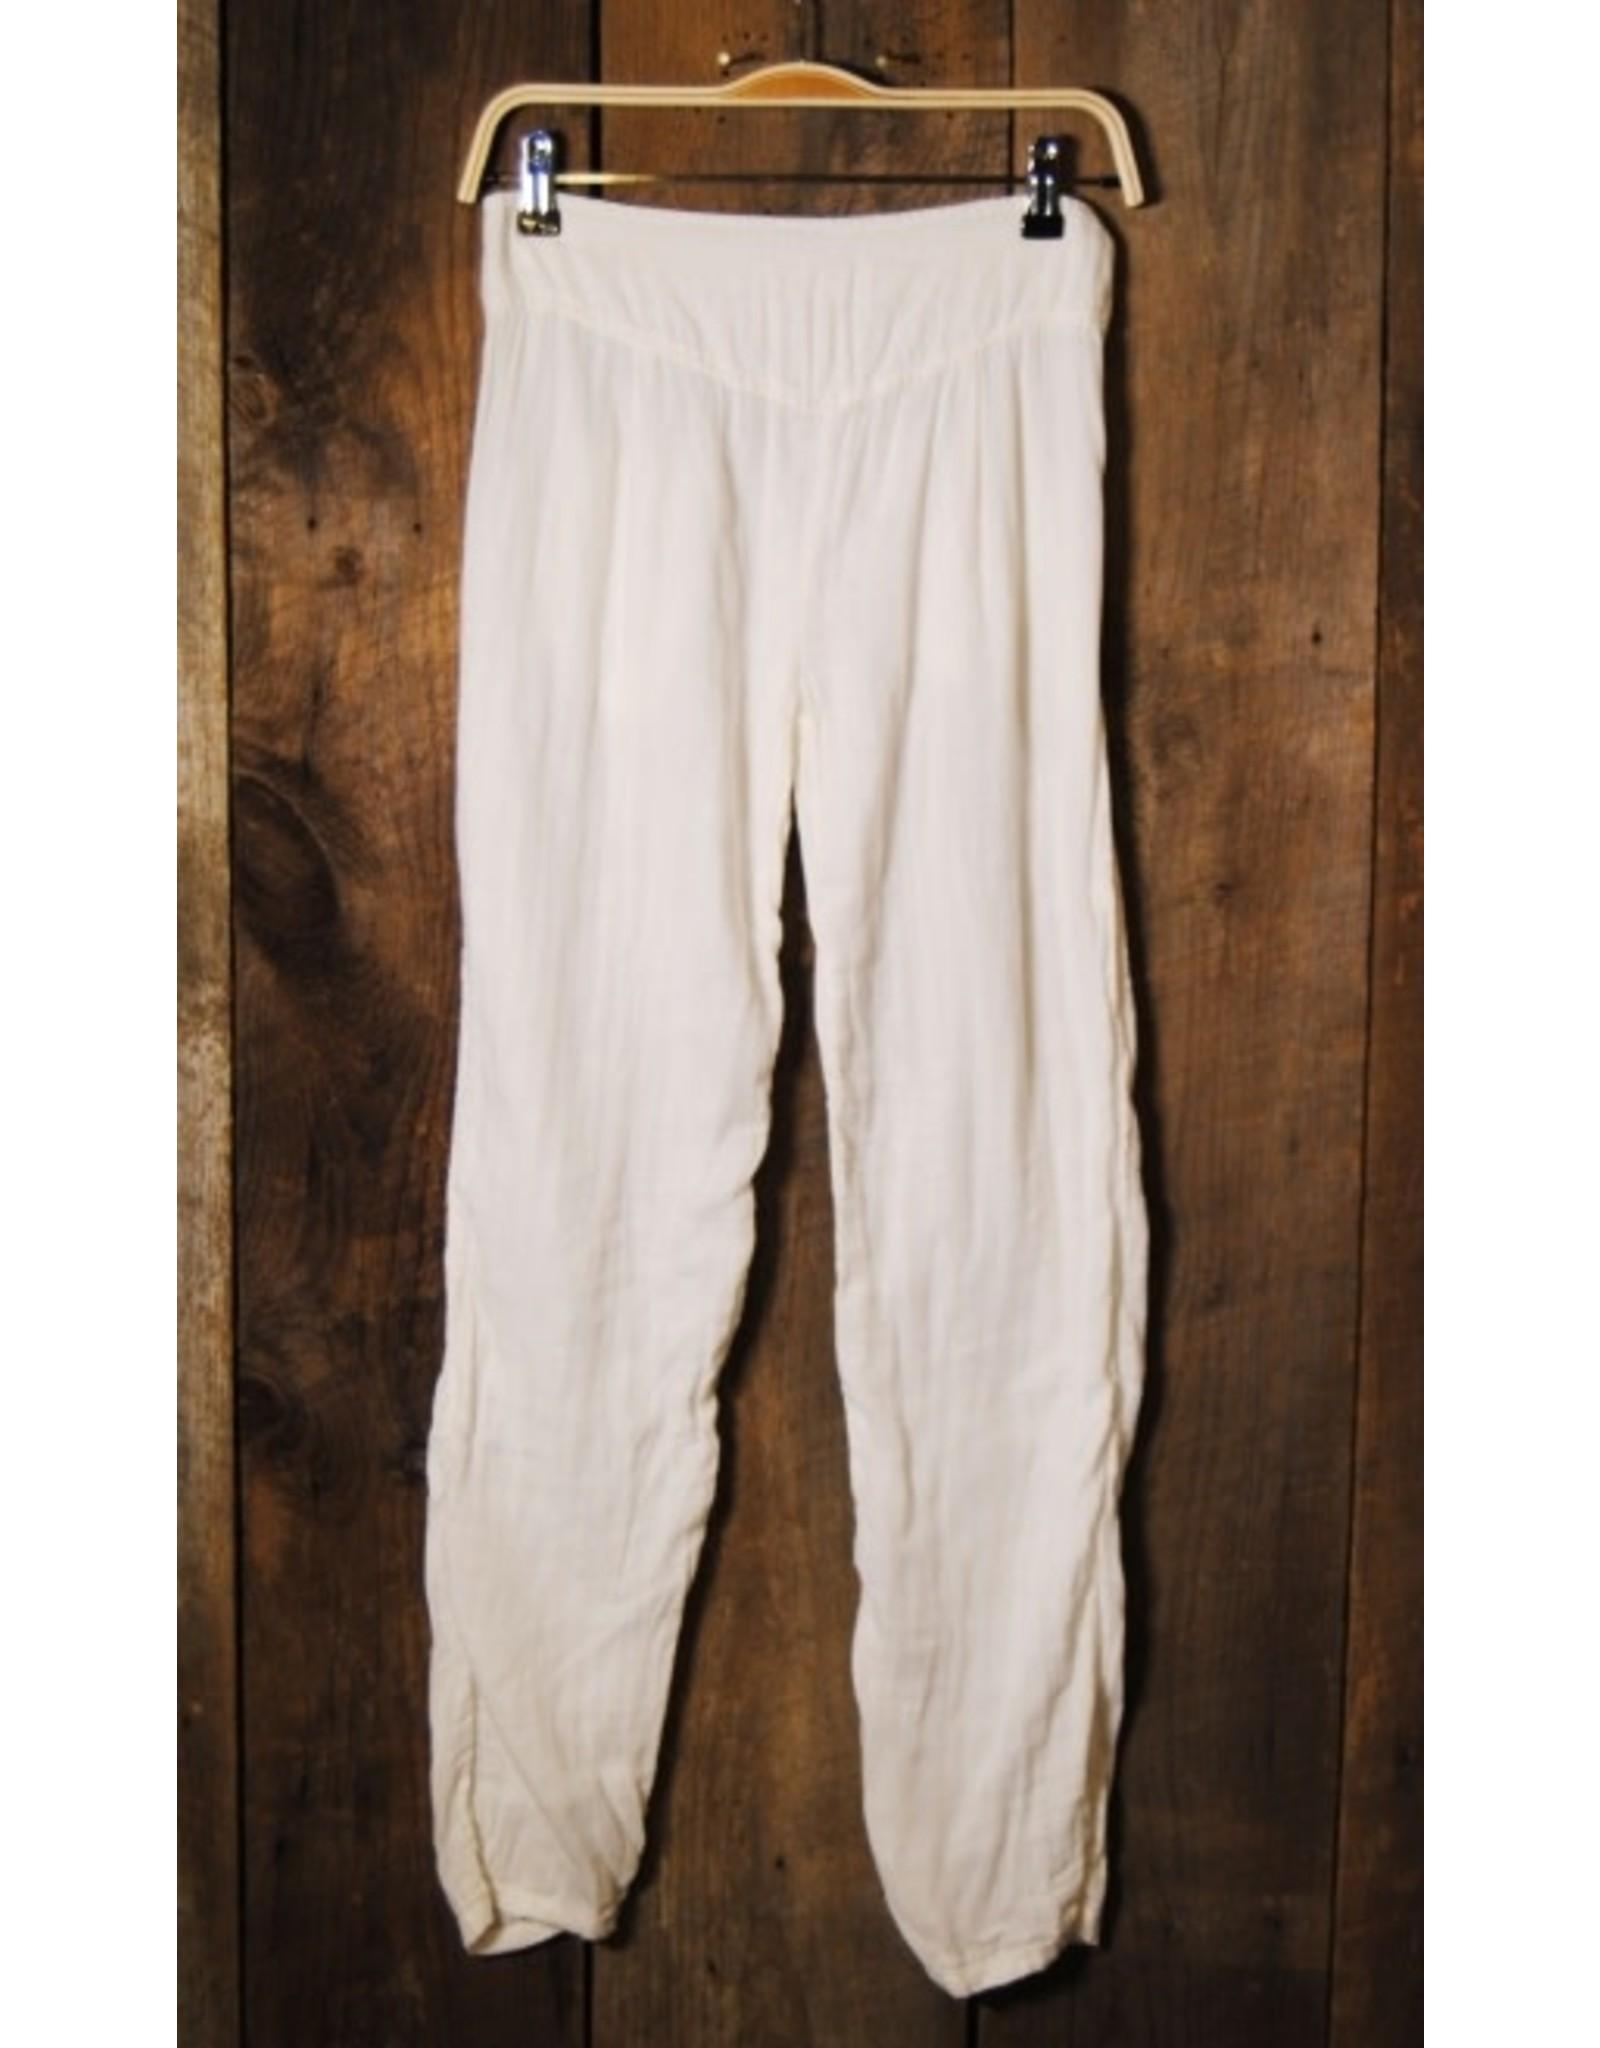 Double Cotton Leggings, White L/XL, Thailand